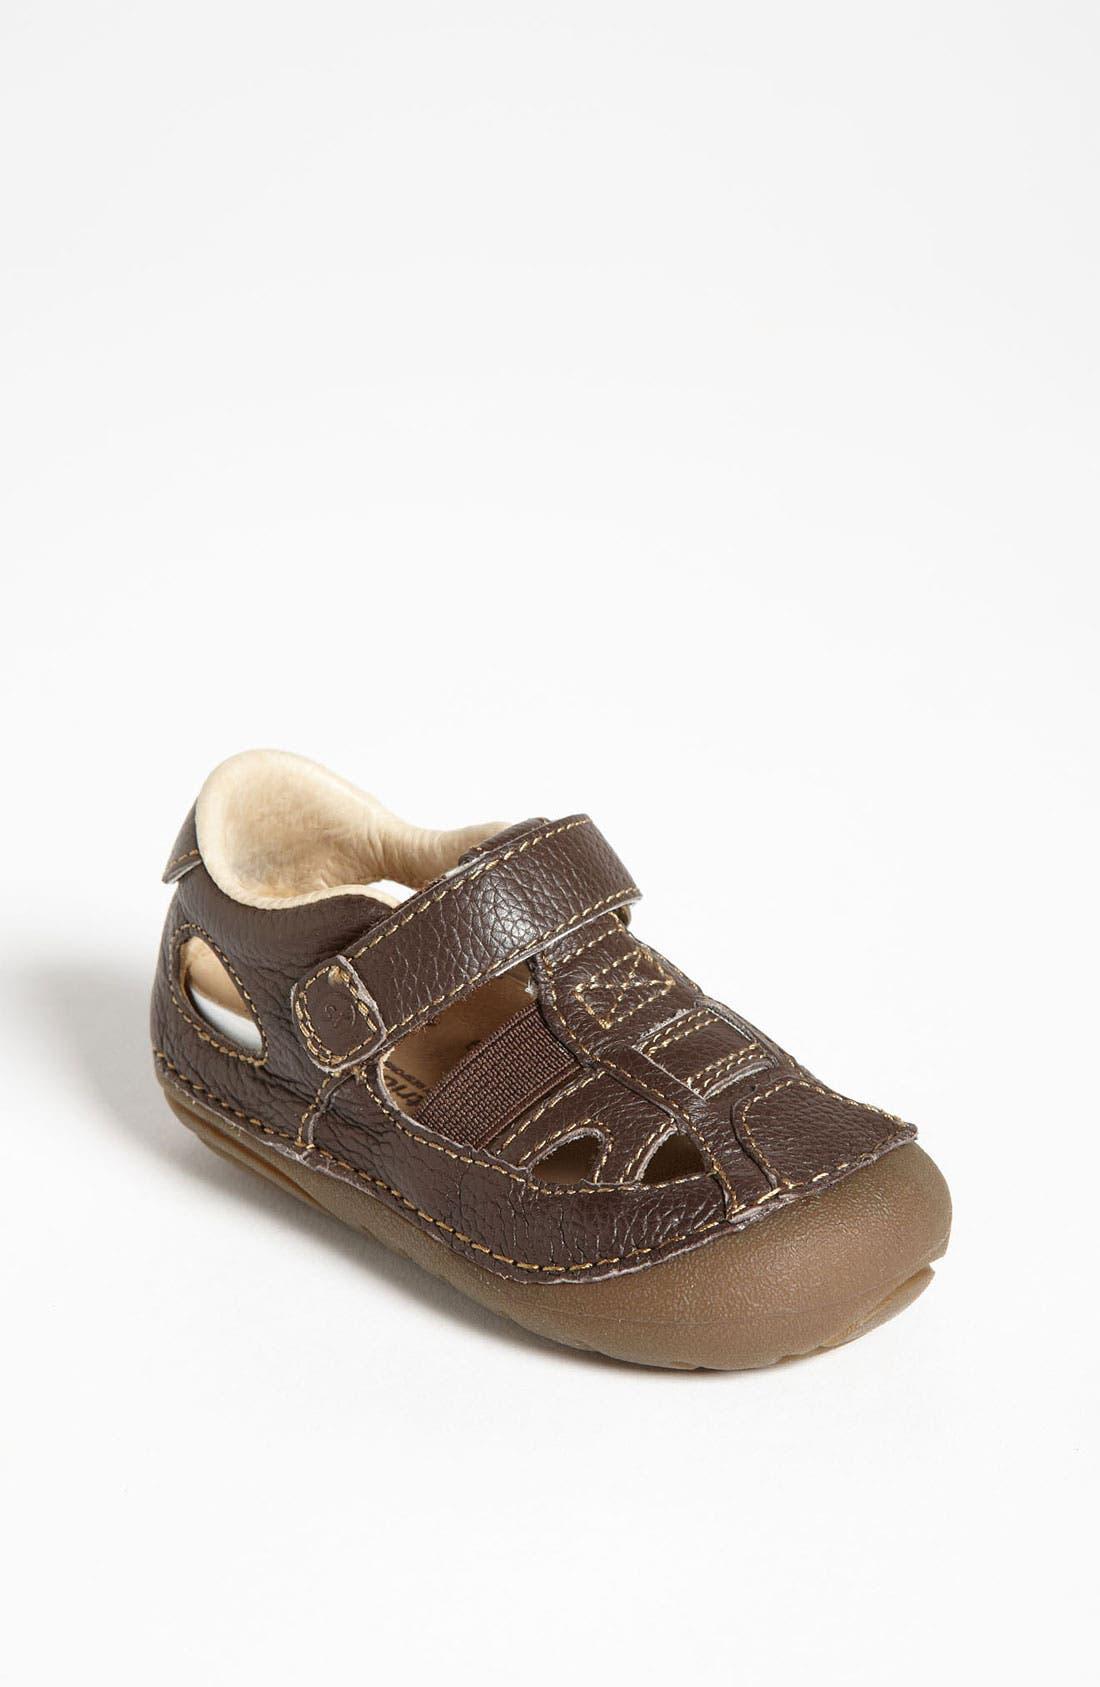 Main Image - Stride Rite 'Tony' Sandal (Baby & Walker)